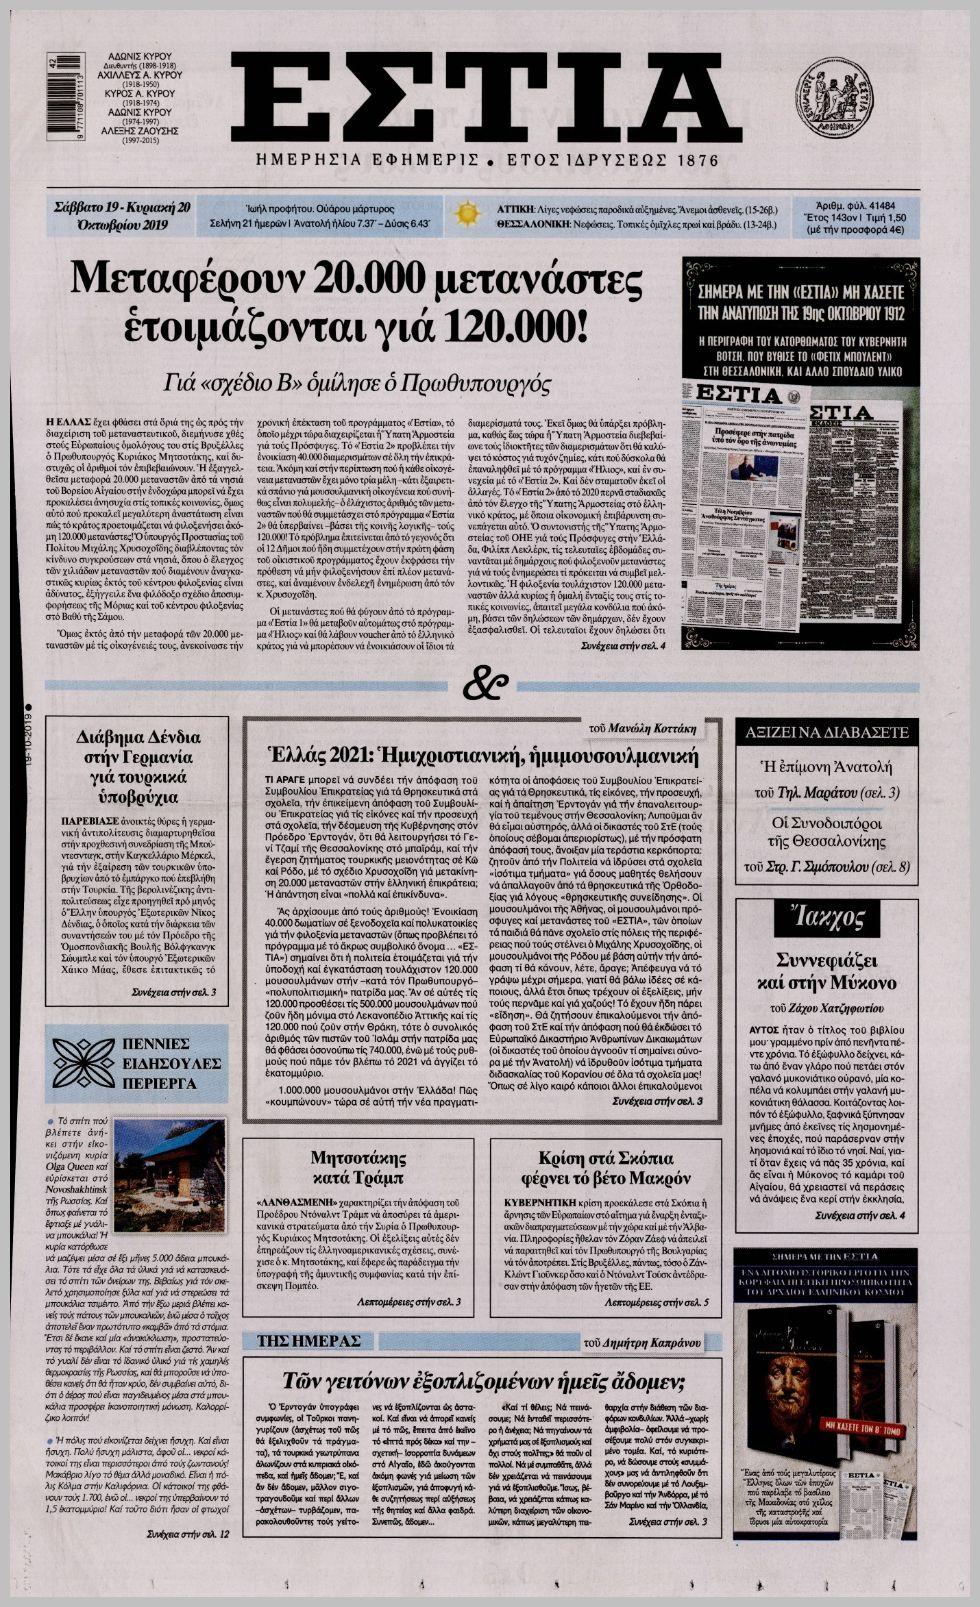 https://protoselida.24media.gr/images/2019/10/19/lrg/20191019_estia_0453.jpg